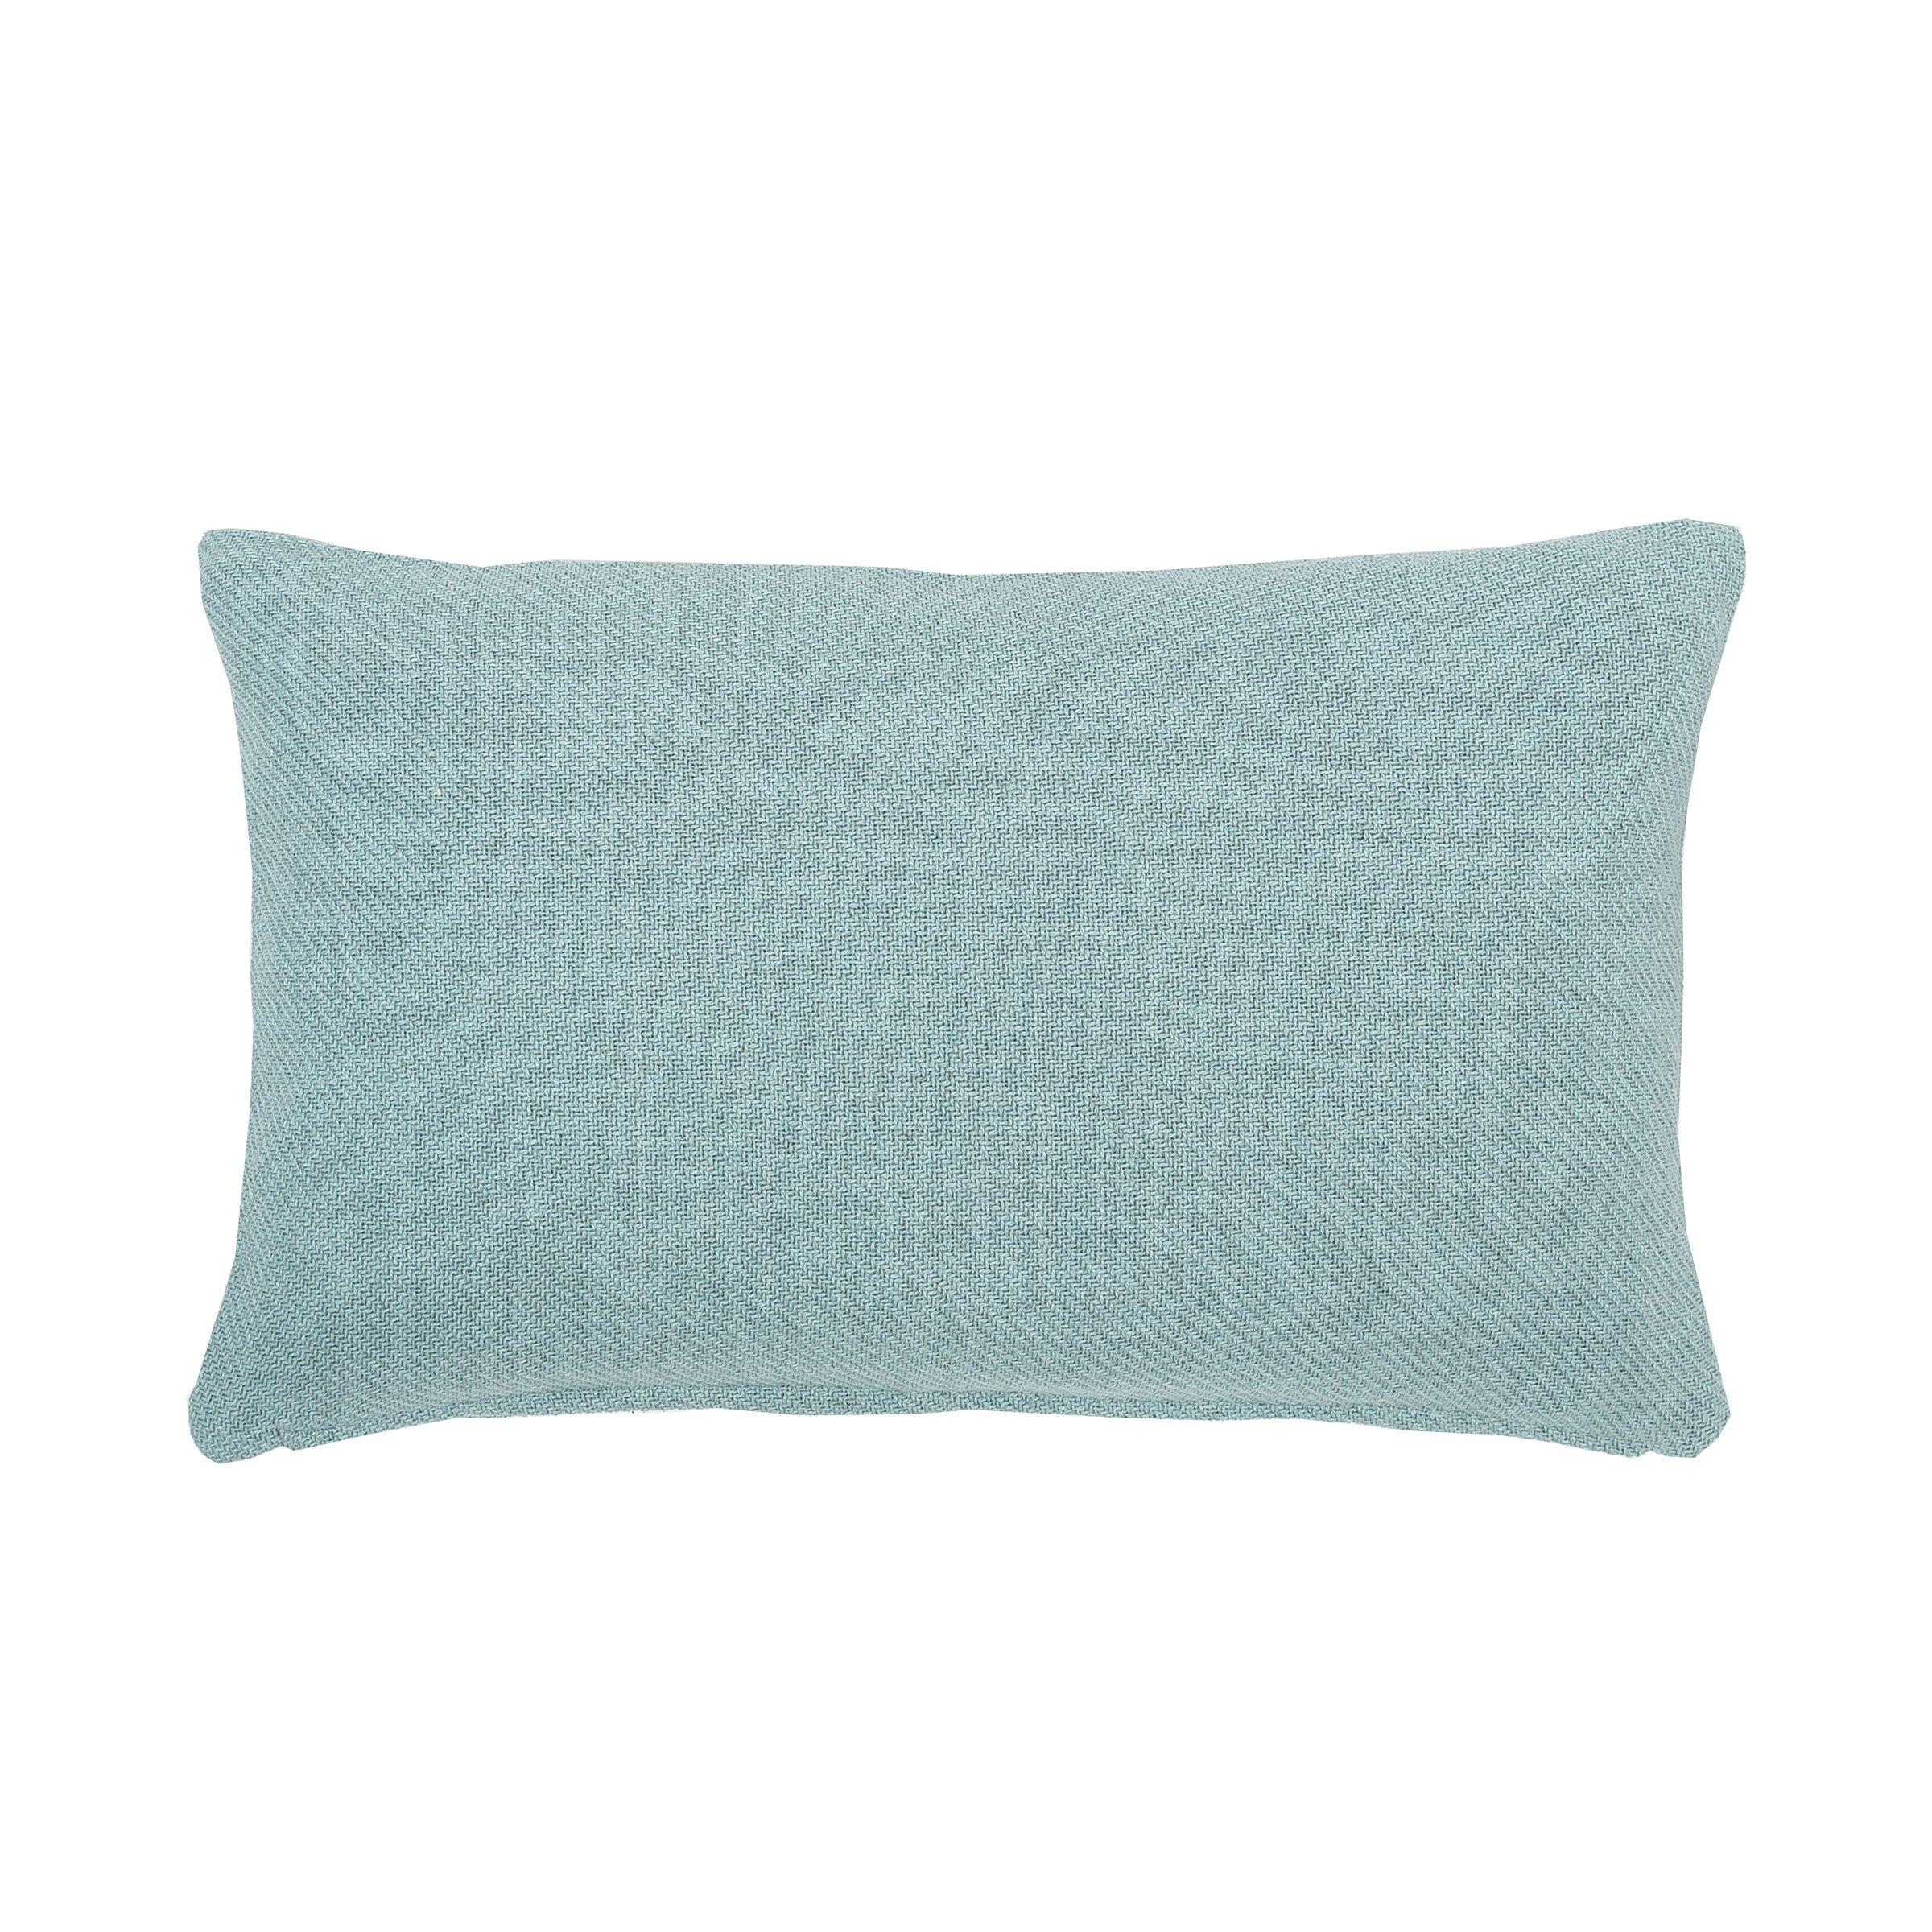 C&F Home Sheridan Sea Glass Woven Pillow 14 x 22 Sea Glass